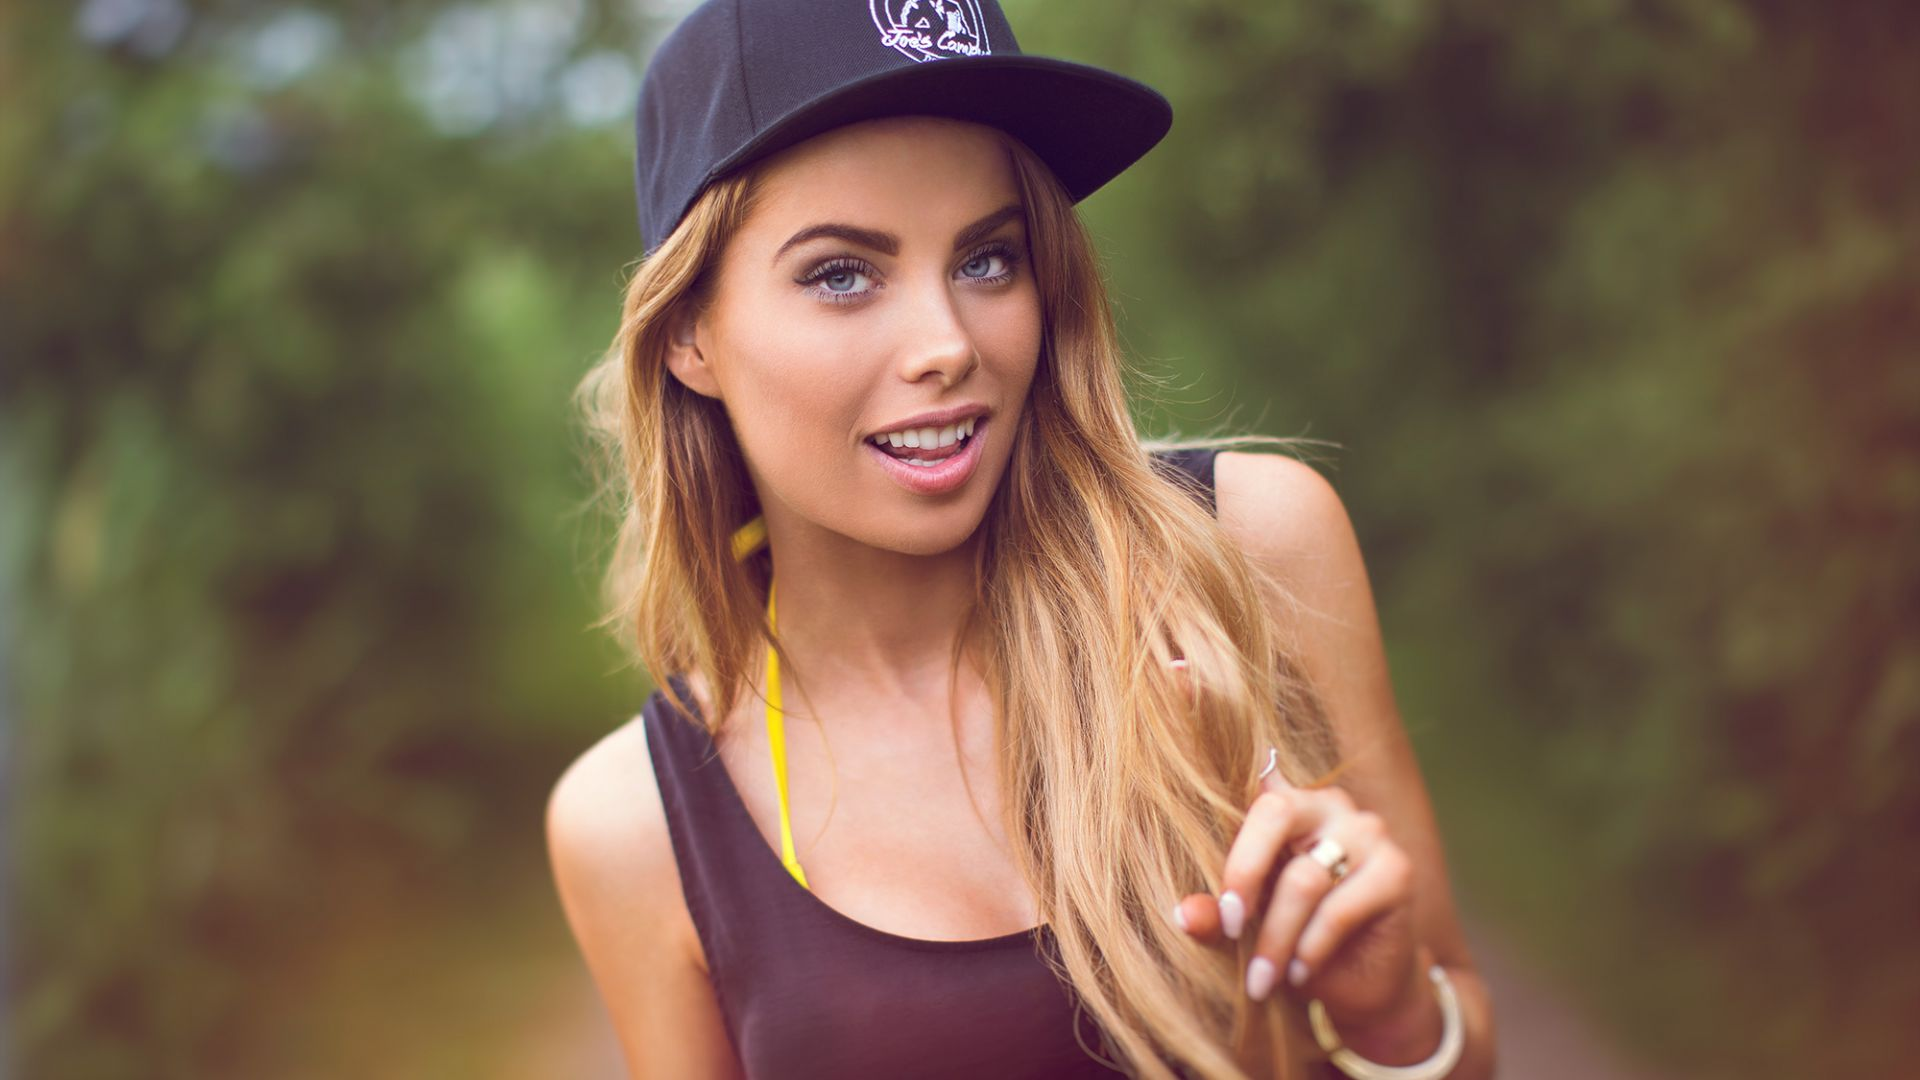 Girl model, blonde, outdoor, baseball cap